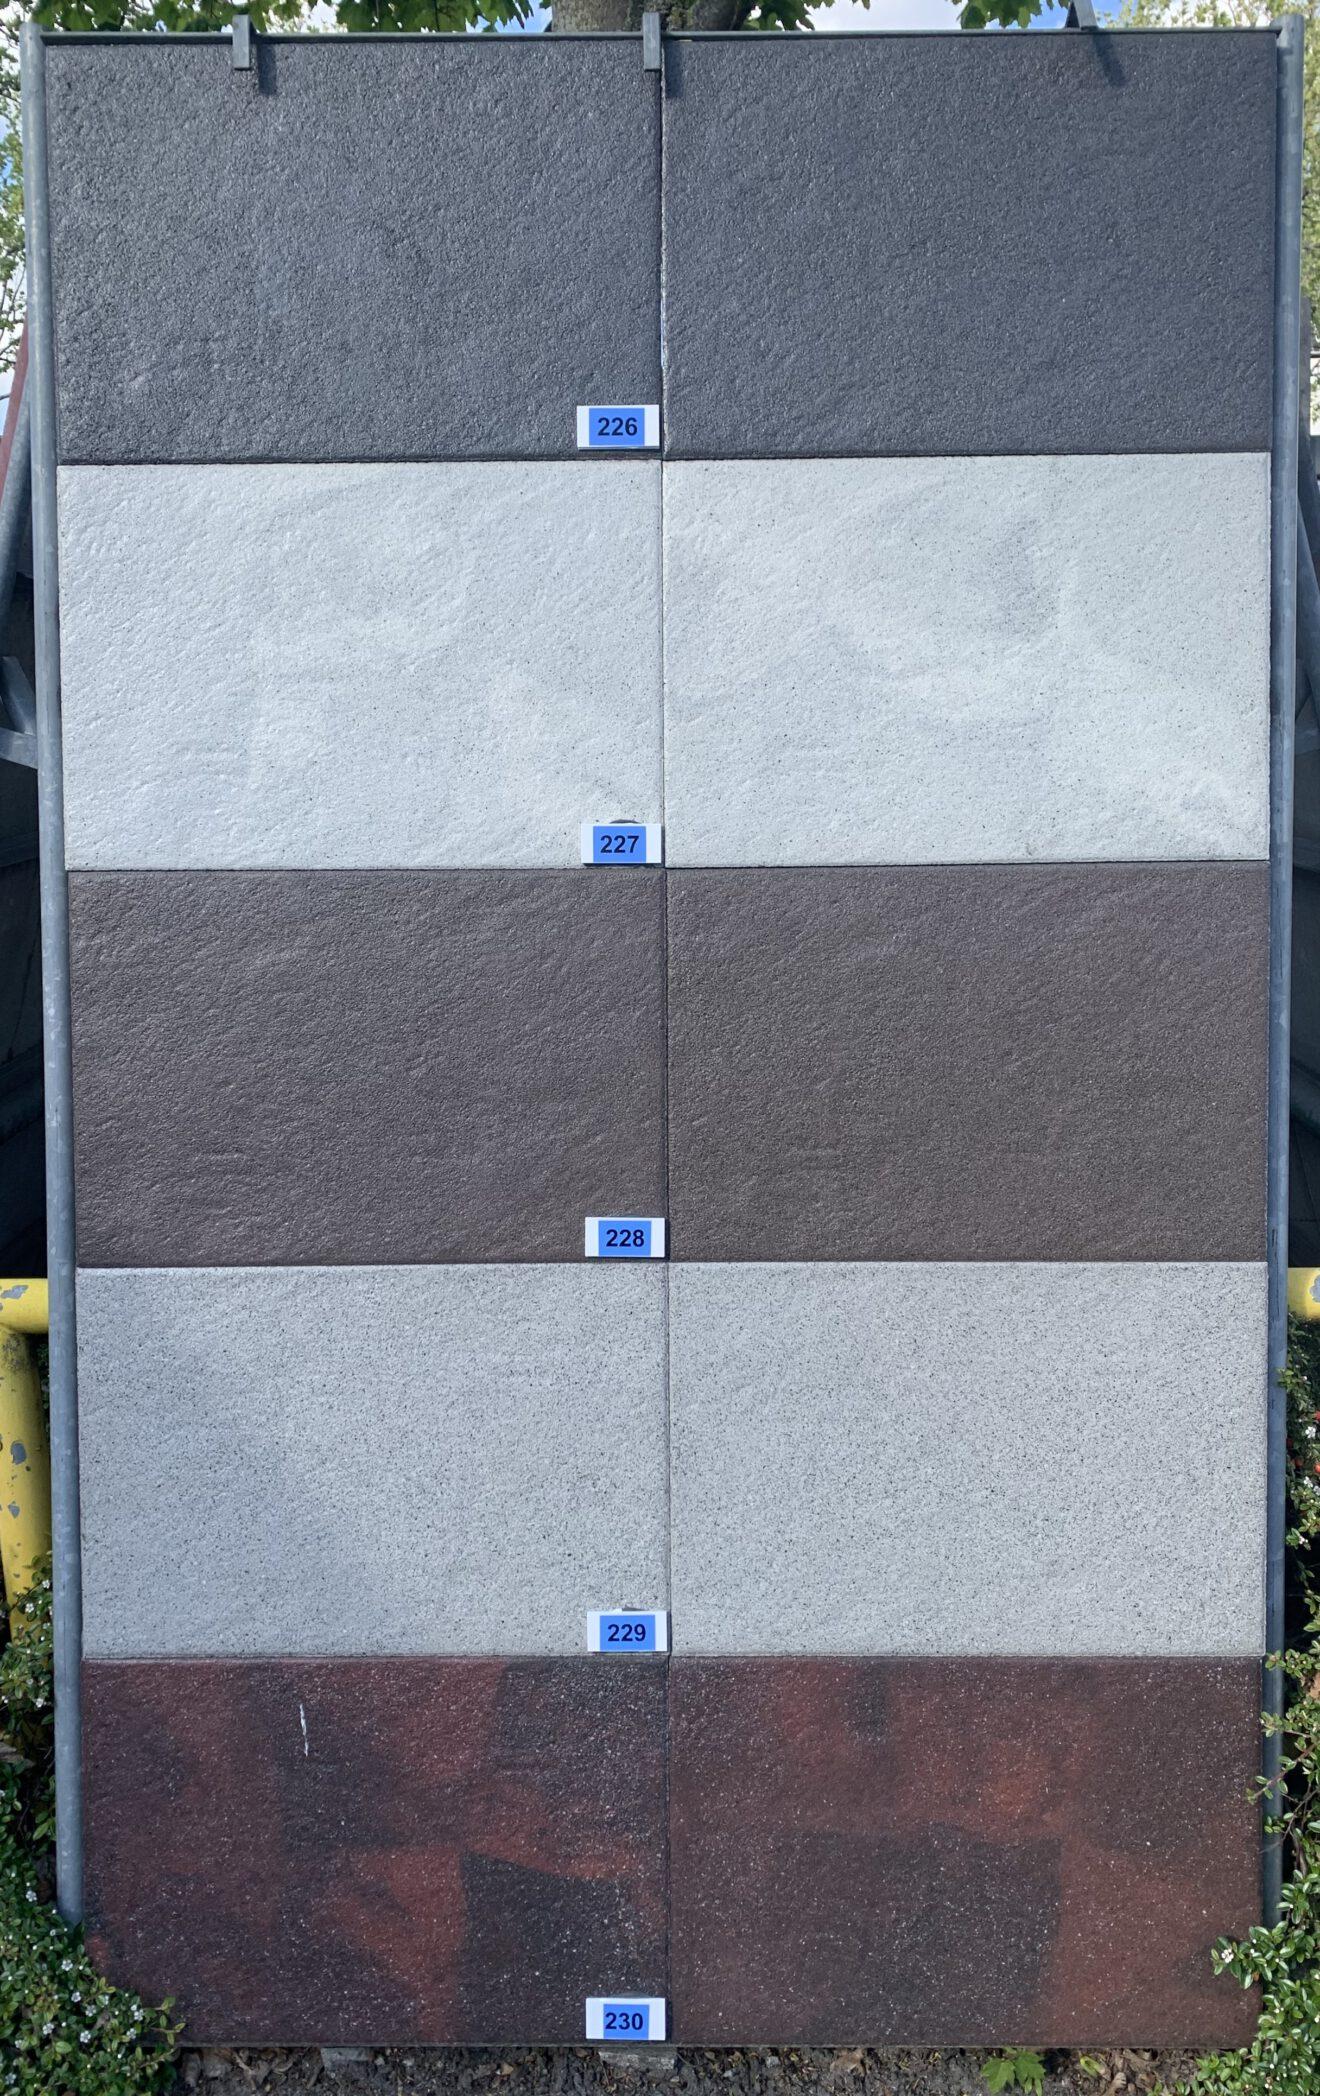 Gartenplatte Novaclean Oklahoma bei Stolzenbach Baustoffe in Bremen kaufen